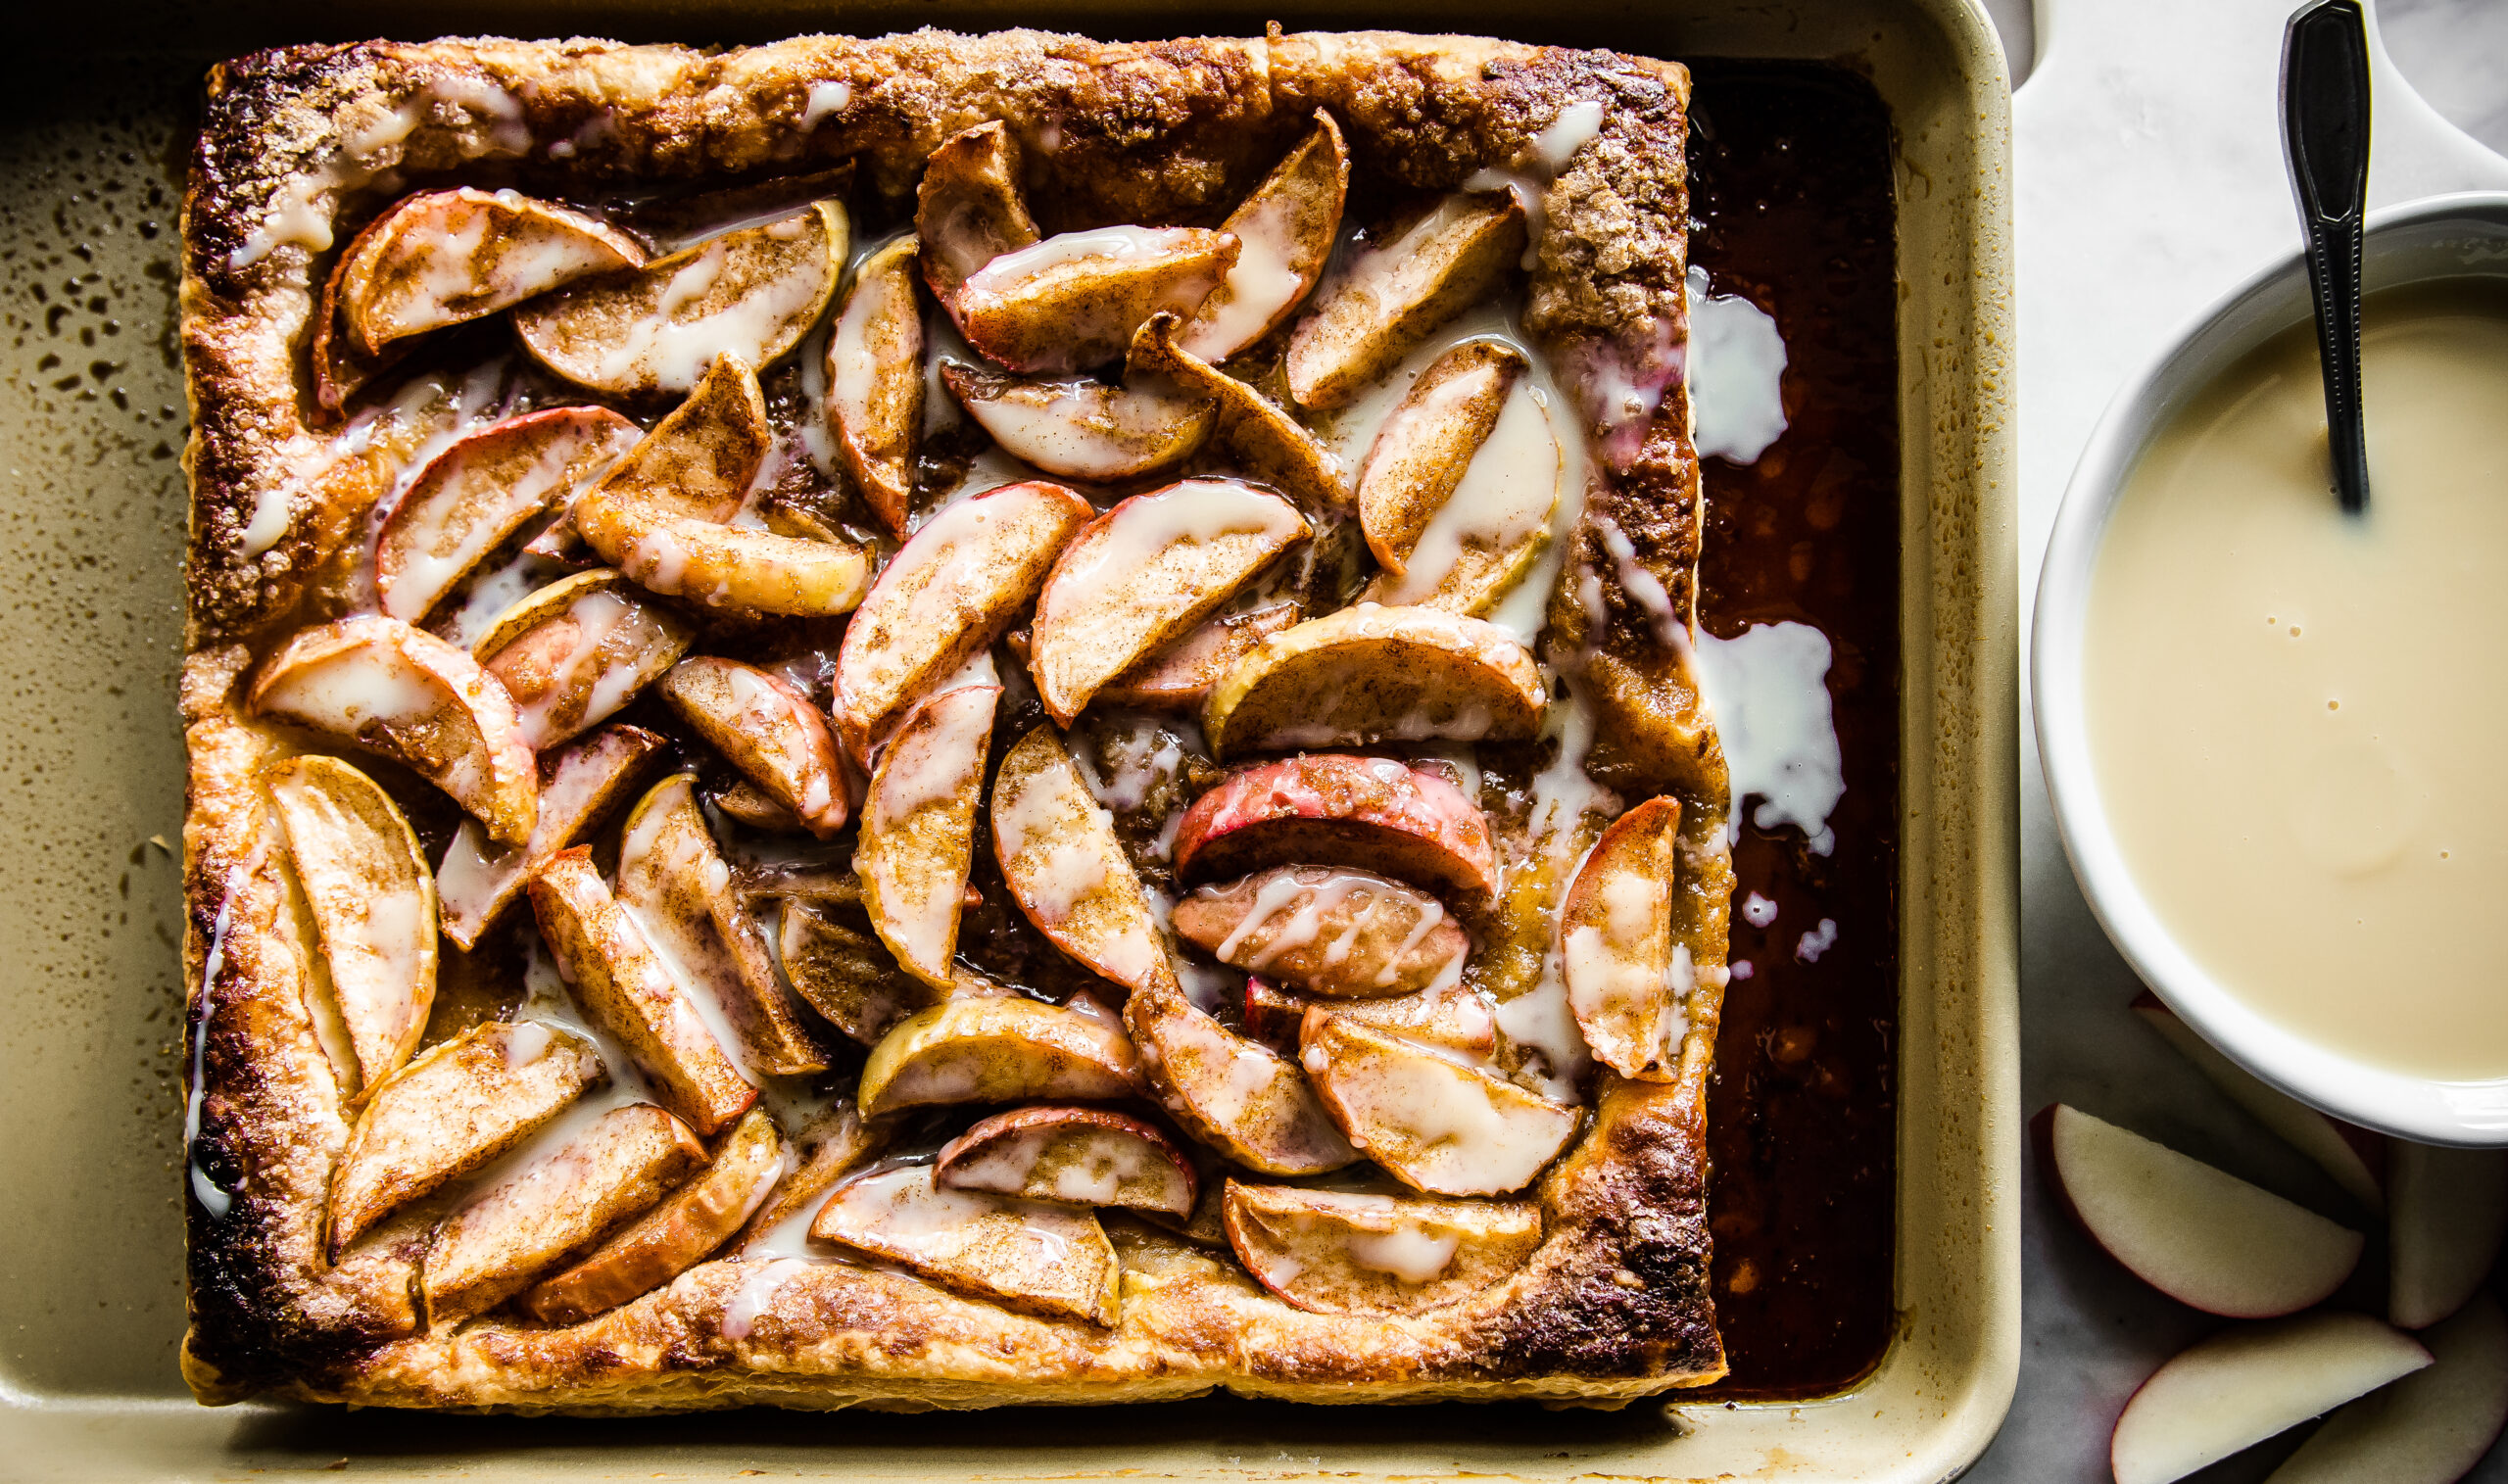 Brown Sugar Cinnamon Apple Tart 12×7 (1 of 1)